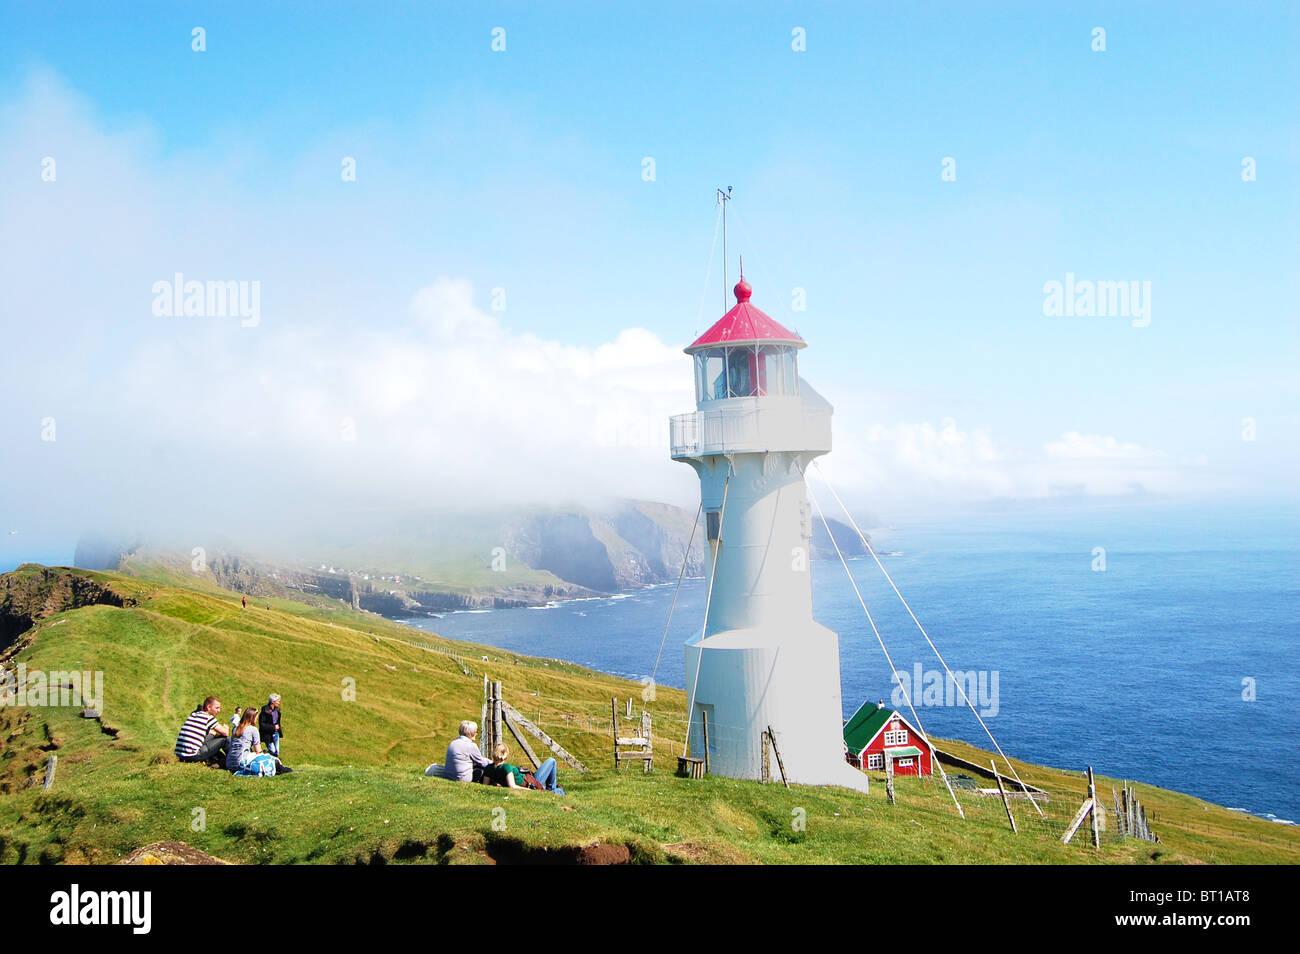 Lighthouse on Mykines, Faroe Islands Photo Stock